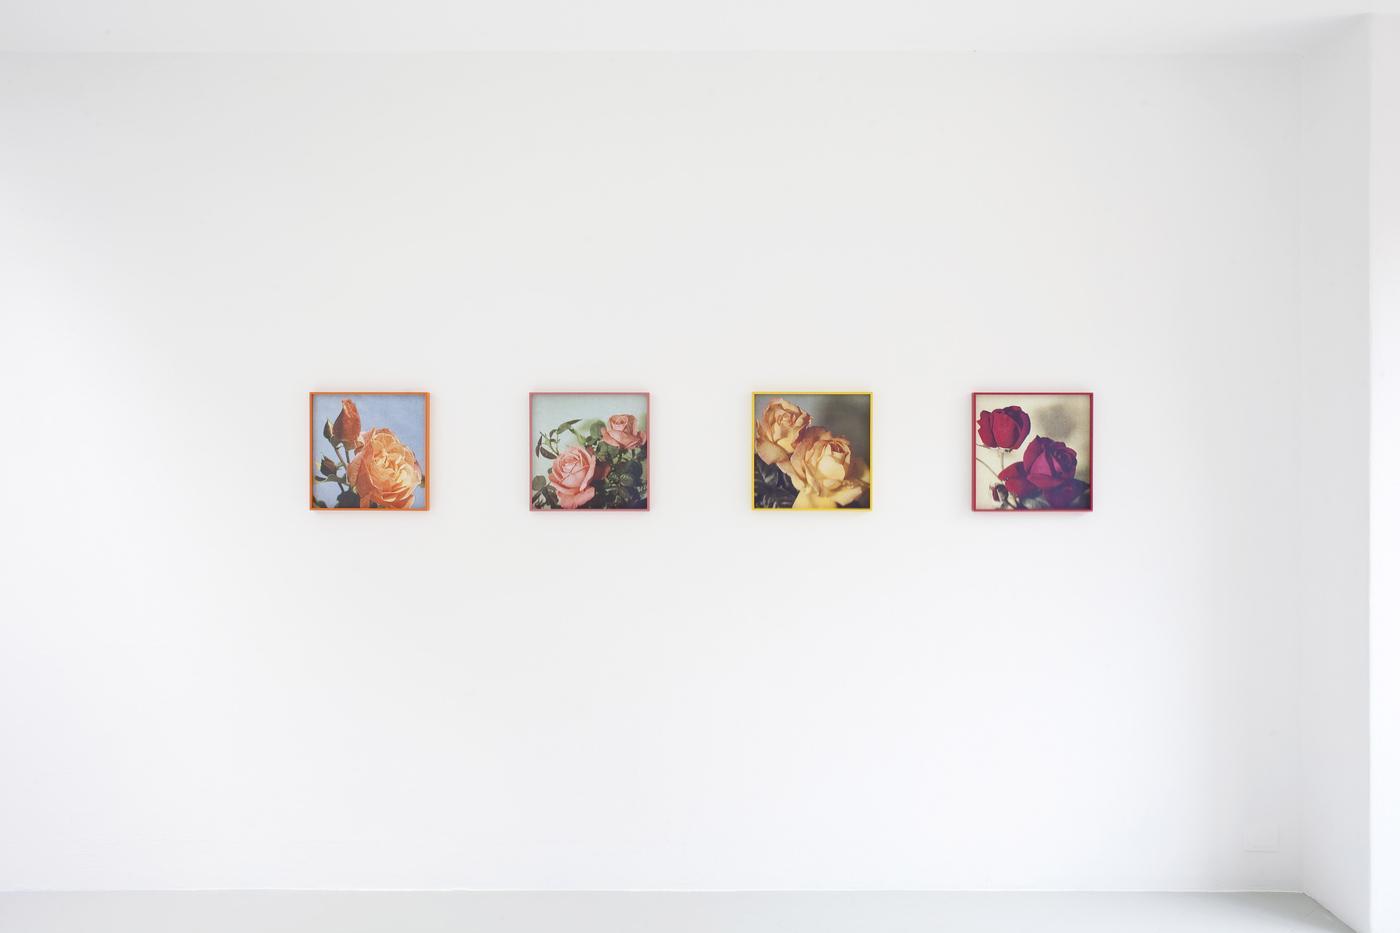 6 - Talisa Lallai, Loveliness Extreme,2016, Inkjet Print, each 41x41 cm - Courtesy Studiolo, Milan